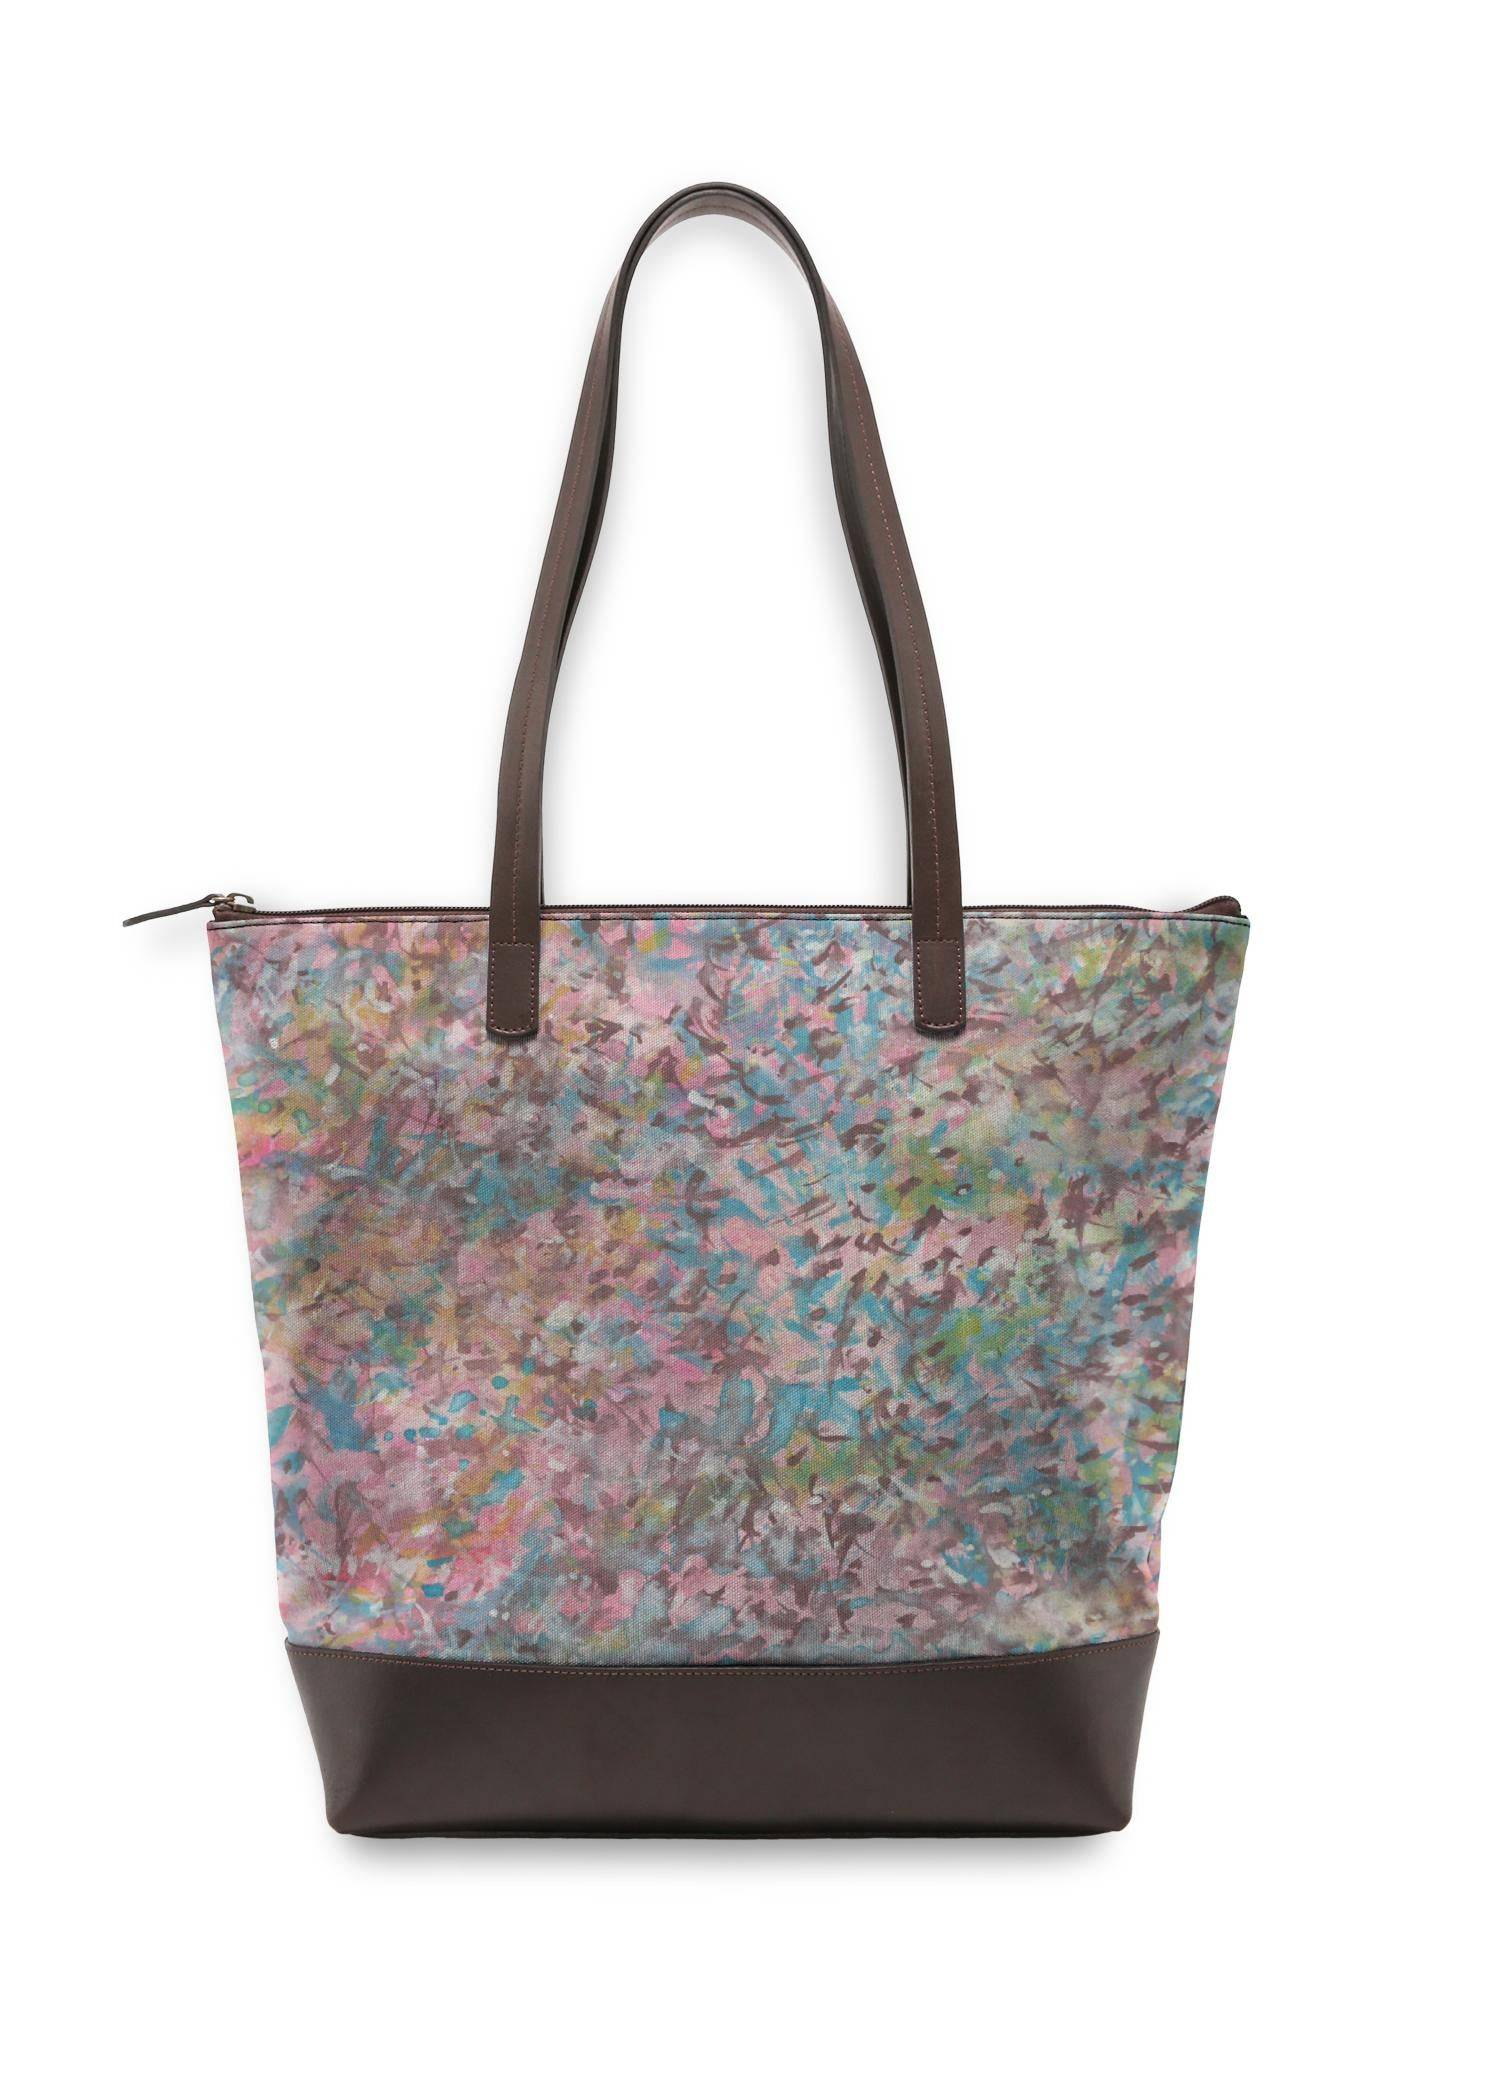 VIDA Statement Bag - Fashion Splashes by VIDA Original Artist  - Size: One Size